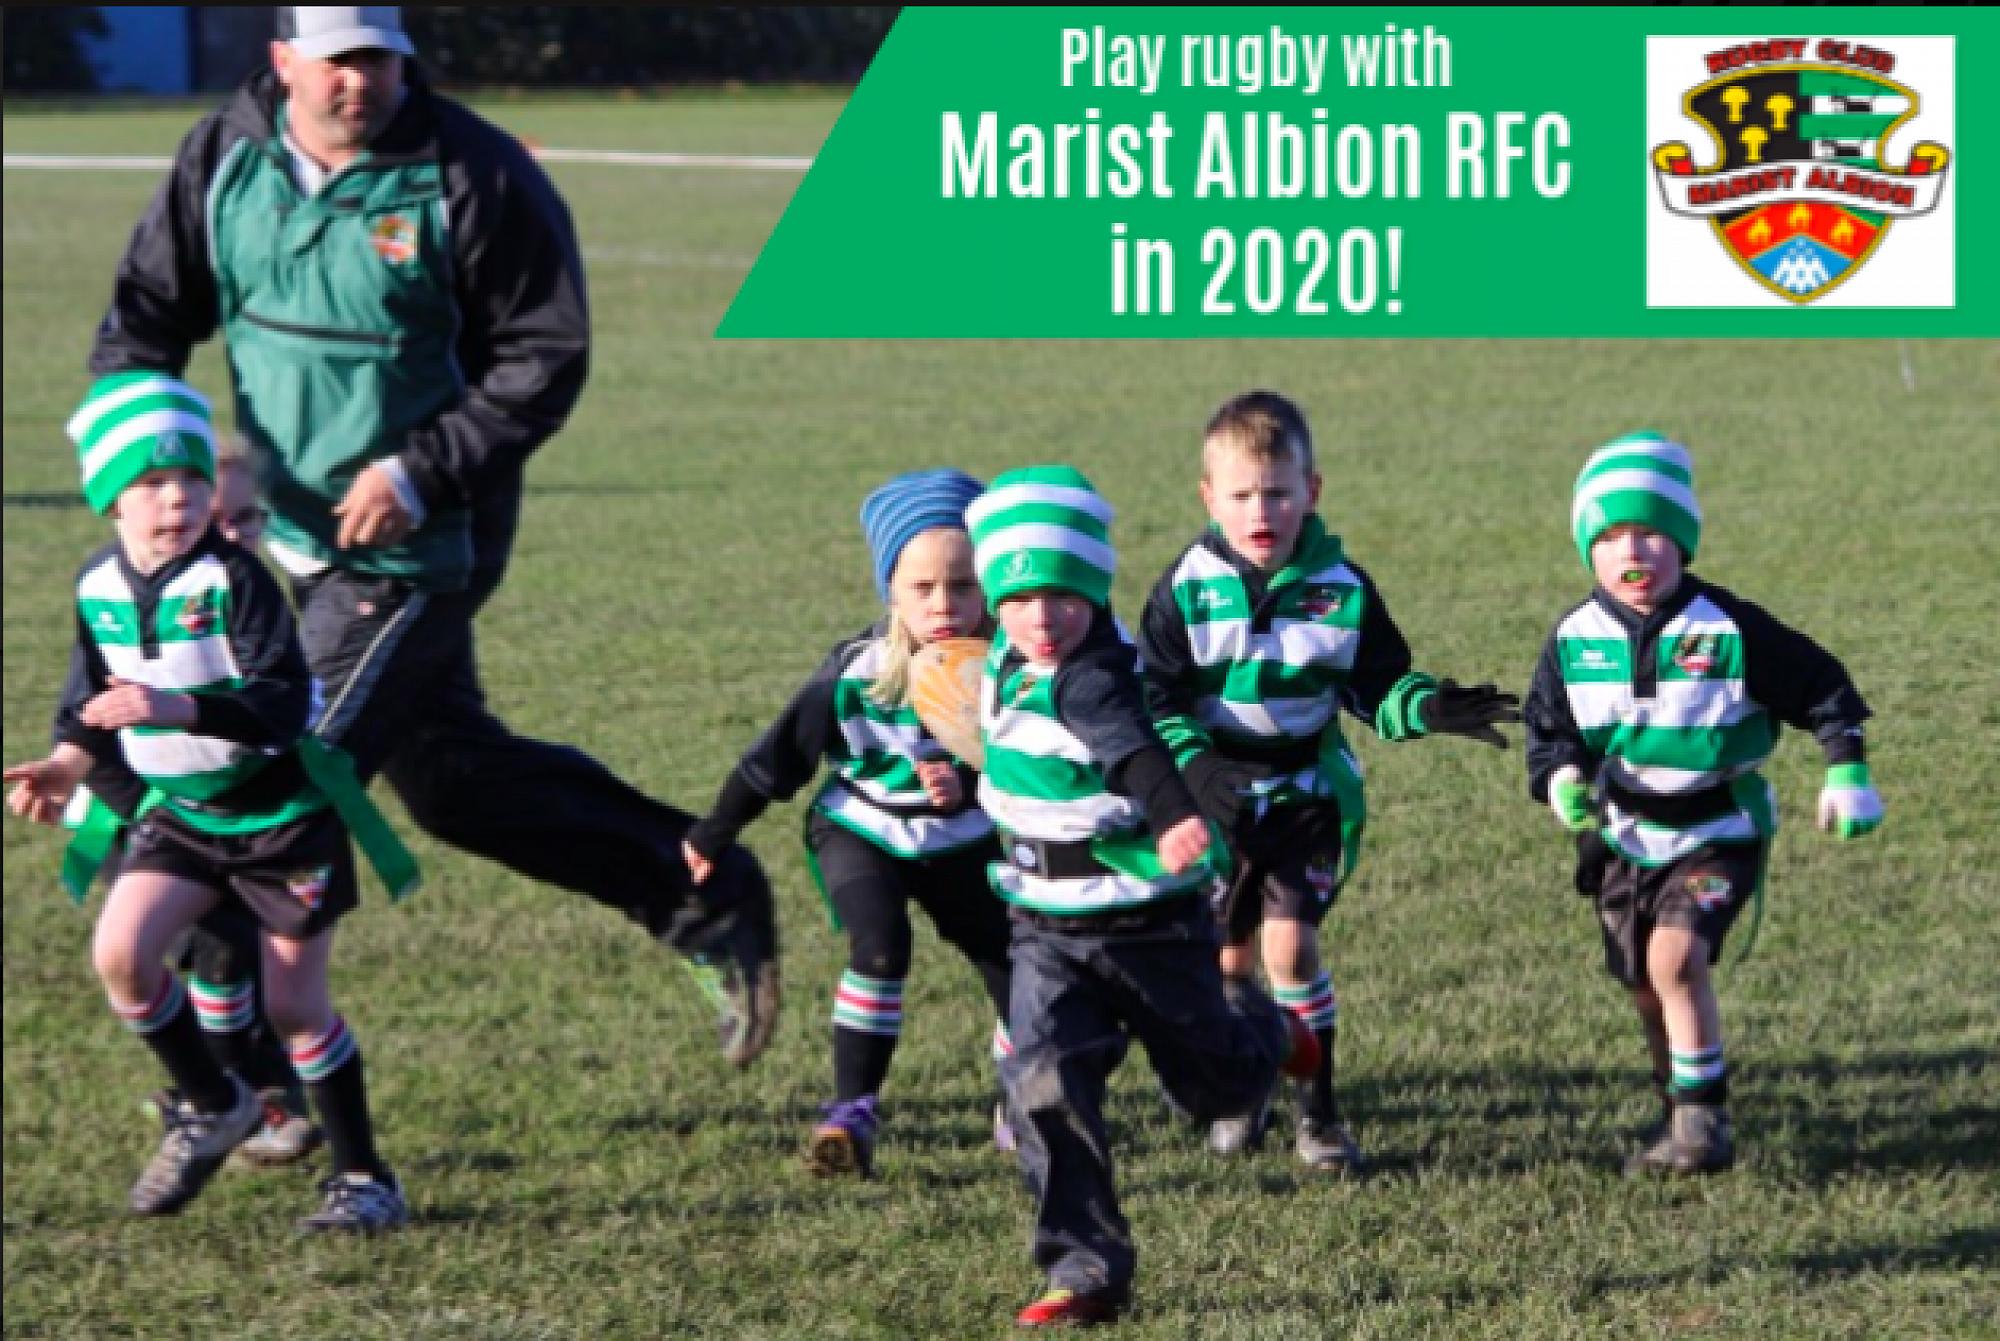 Marist Albion Rfc Junior Rugby